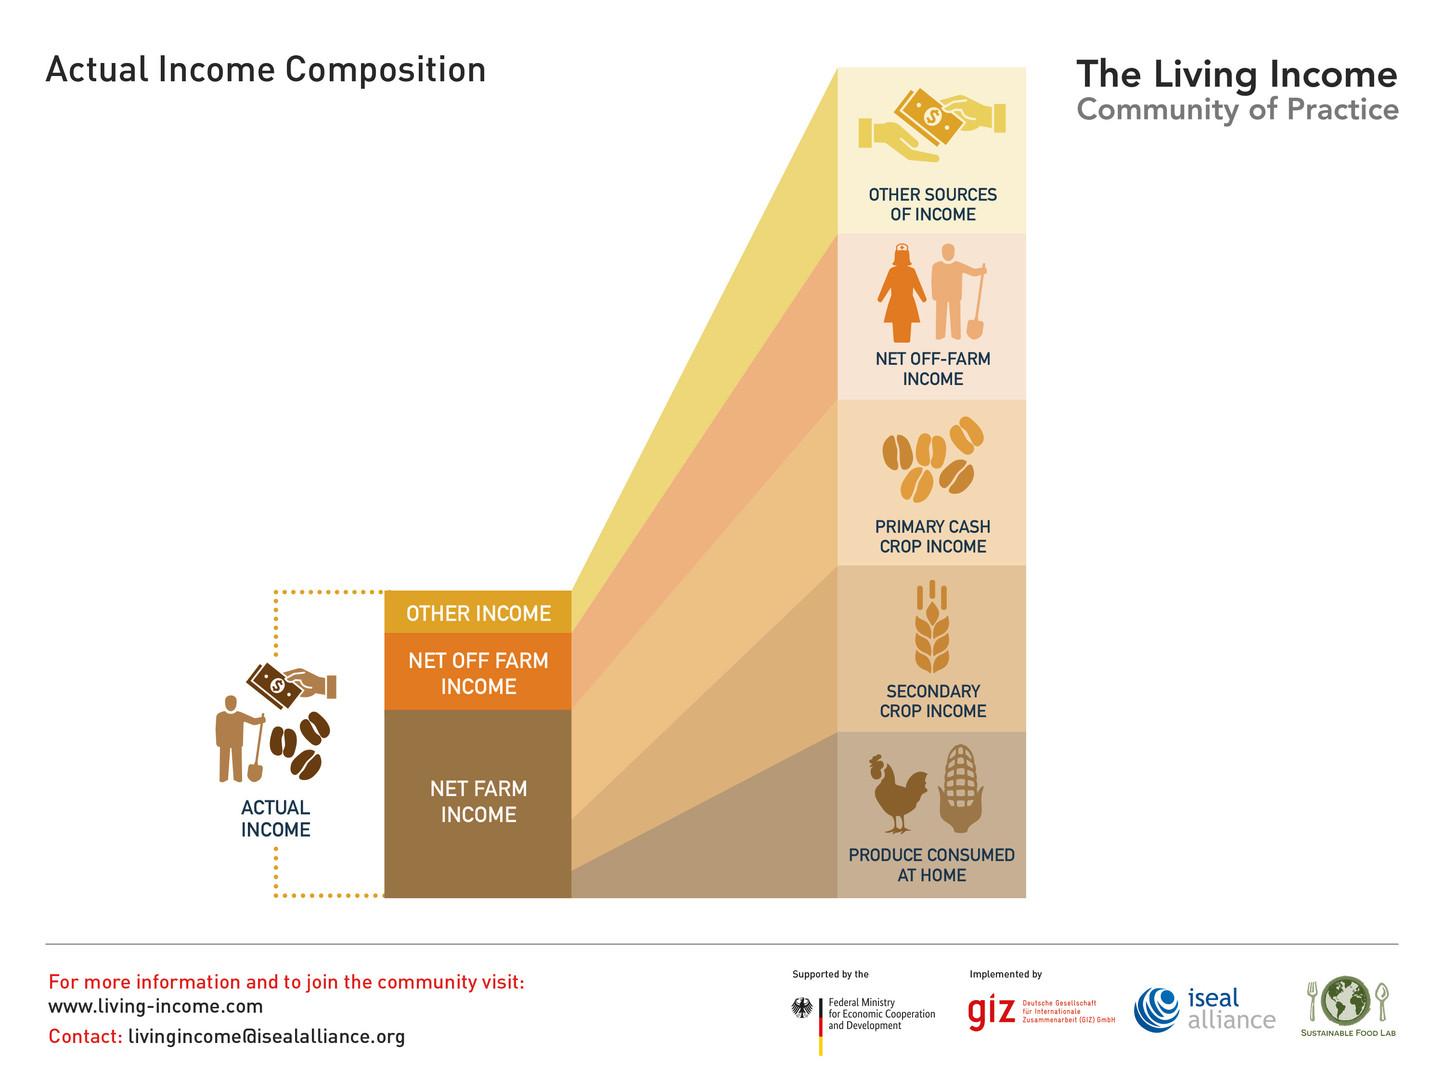 Actual Income Composition - 2019 ©LivingIncomeCommunityofPractice